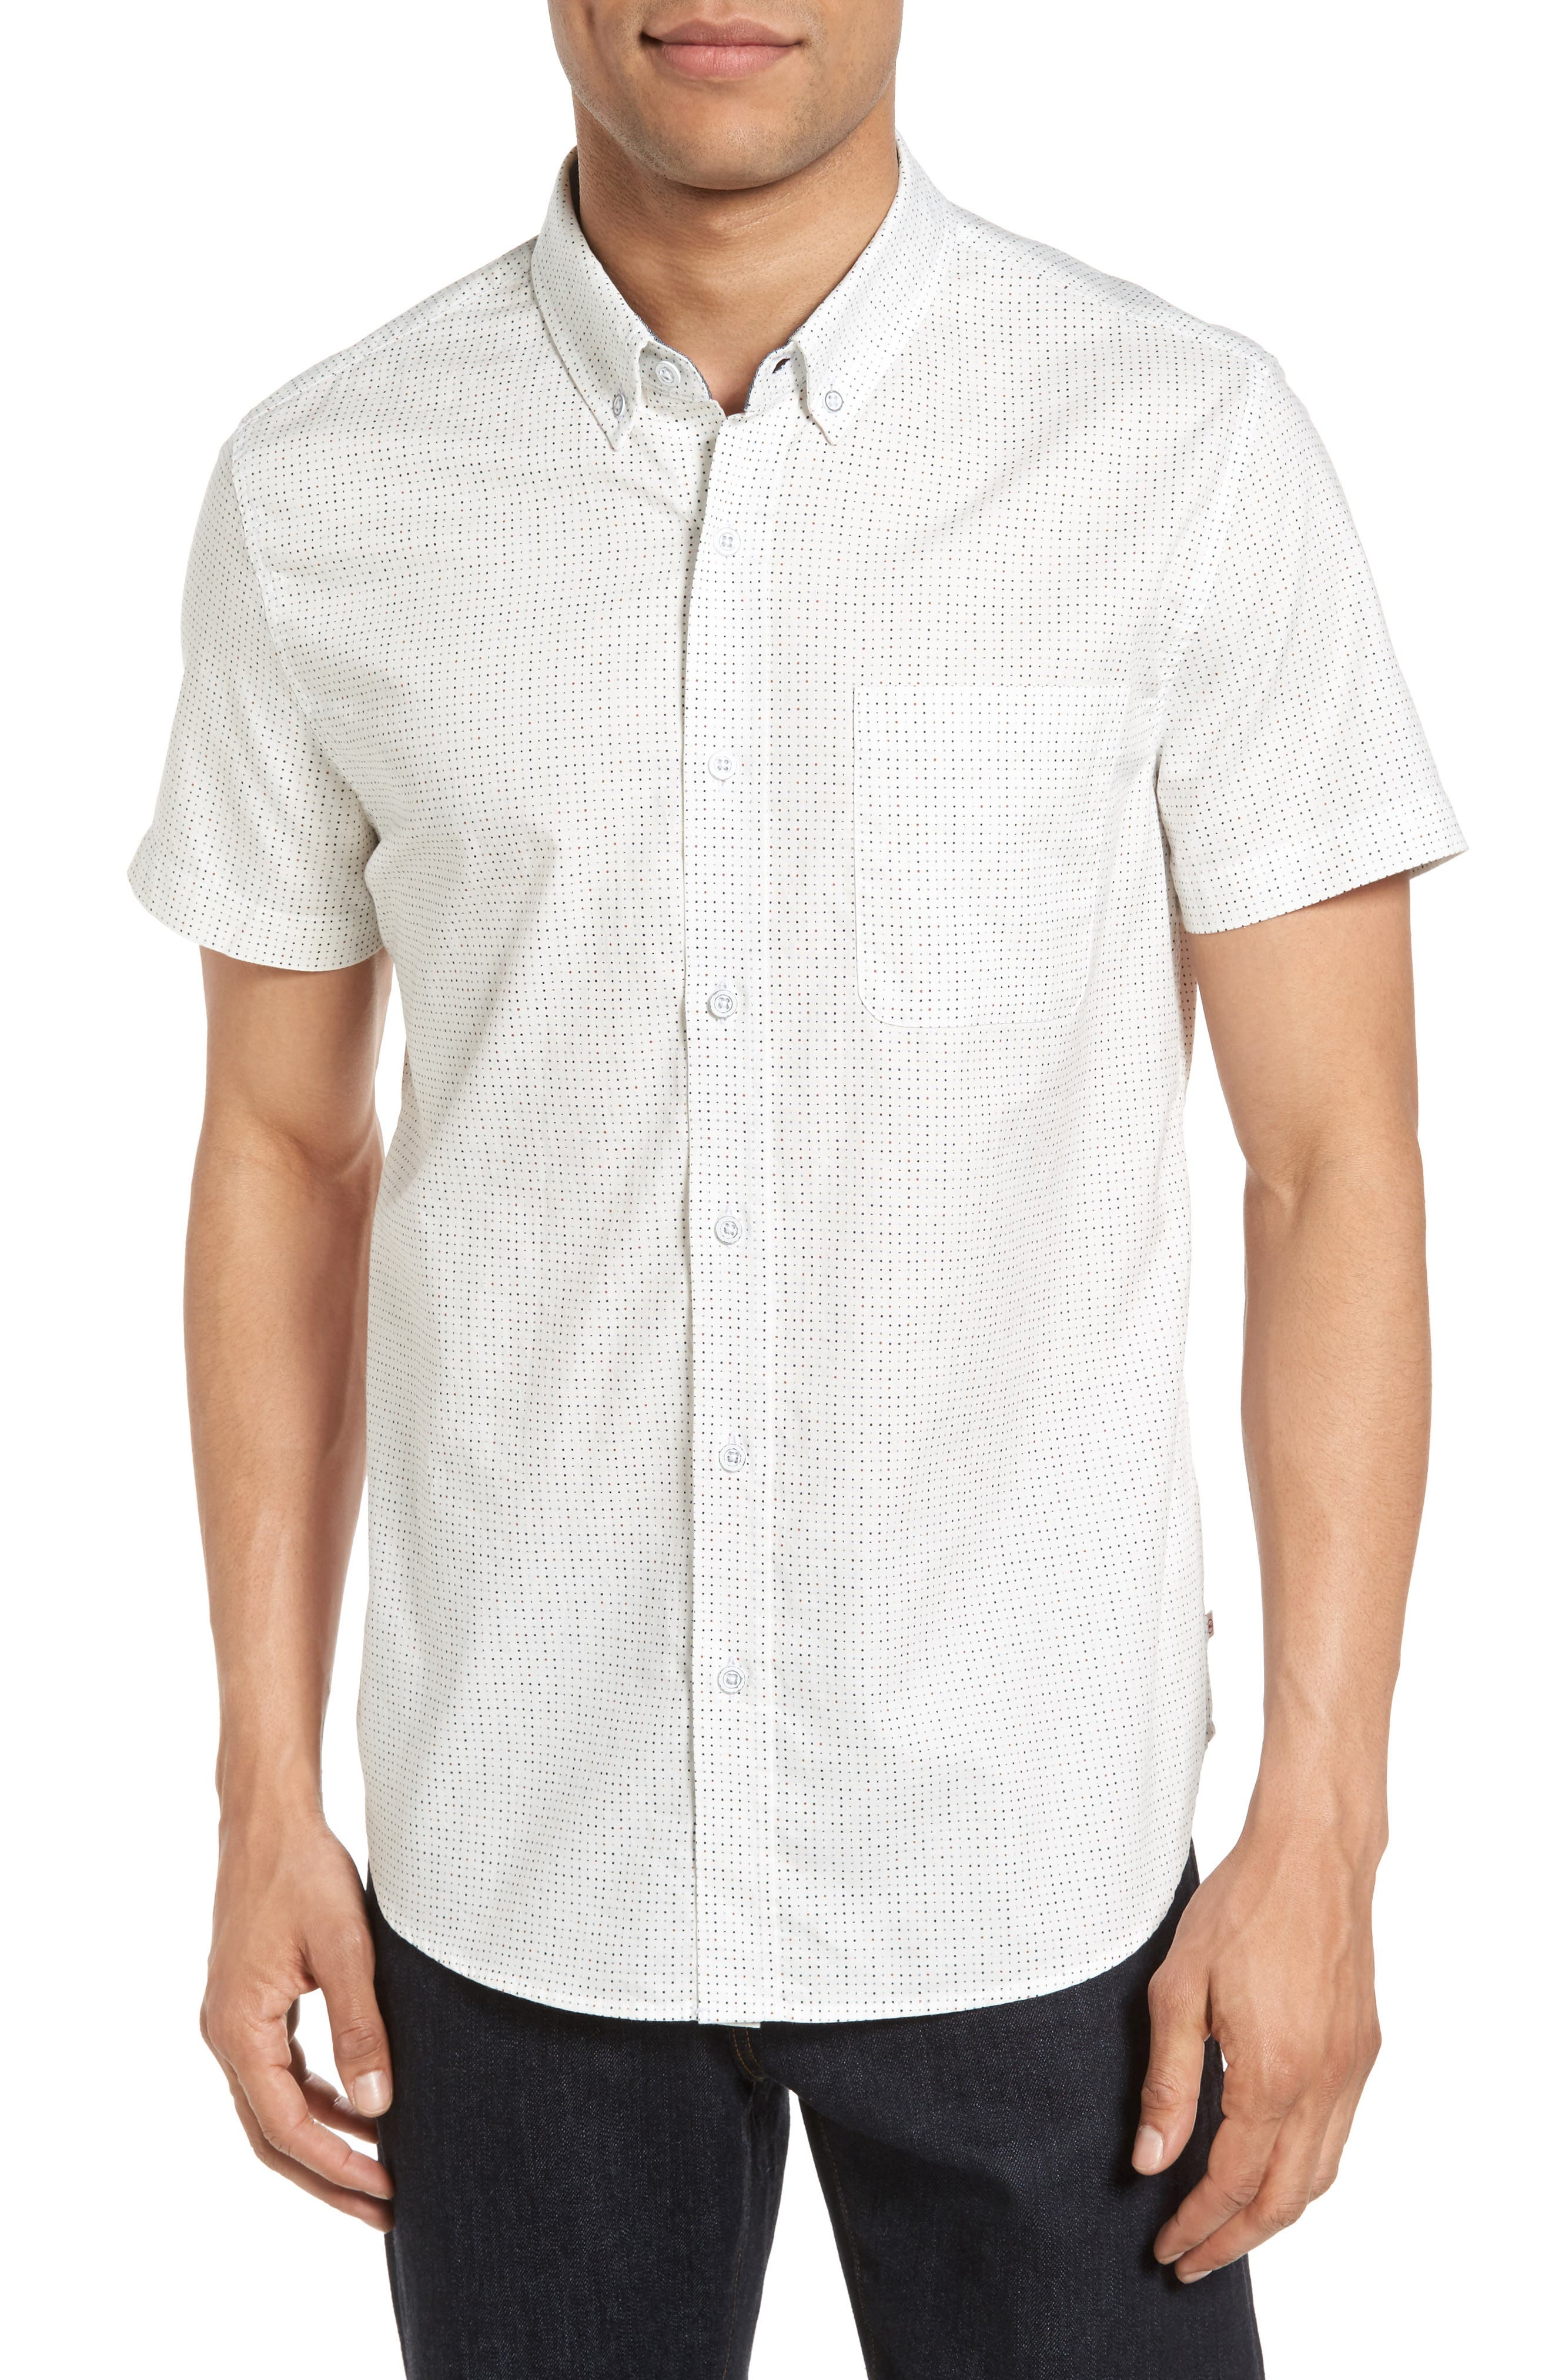 Nash Slim Fit Cotton Sport Shirt,                         Main,                         color, True White/ Multi Dot